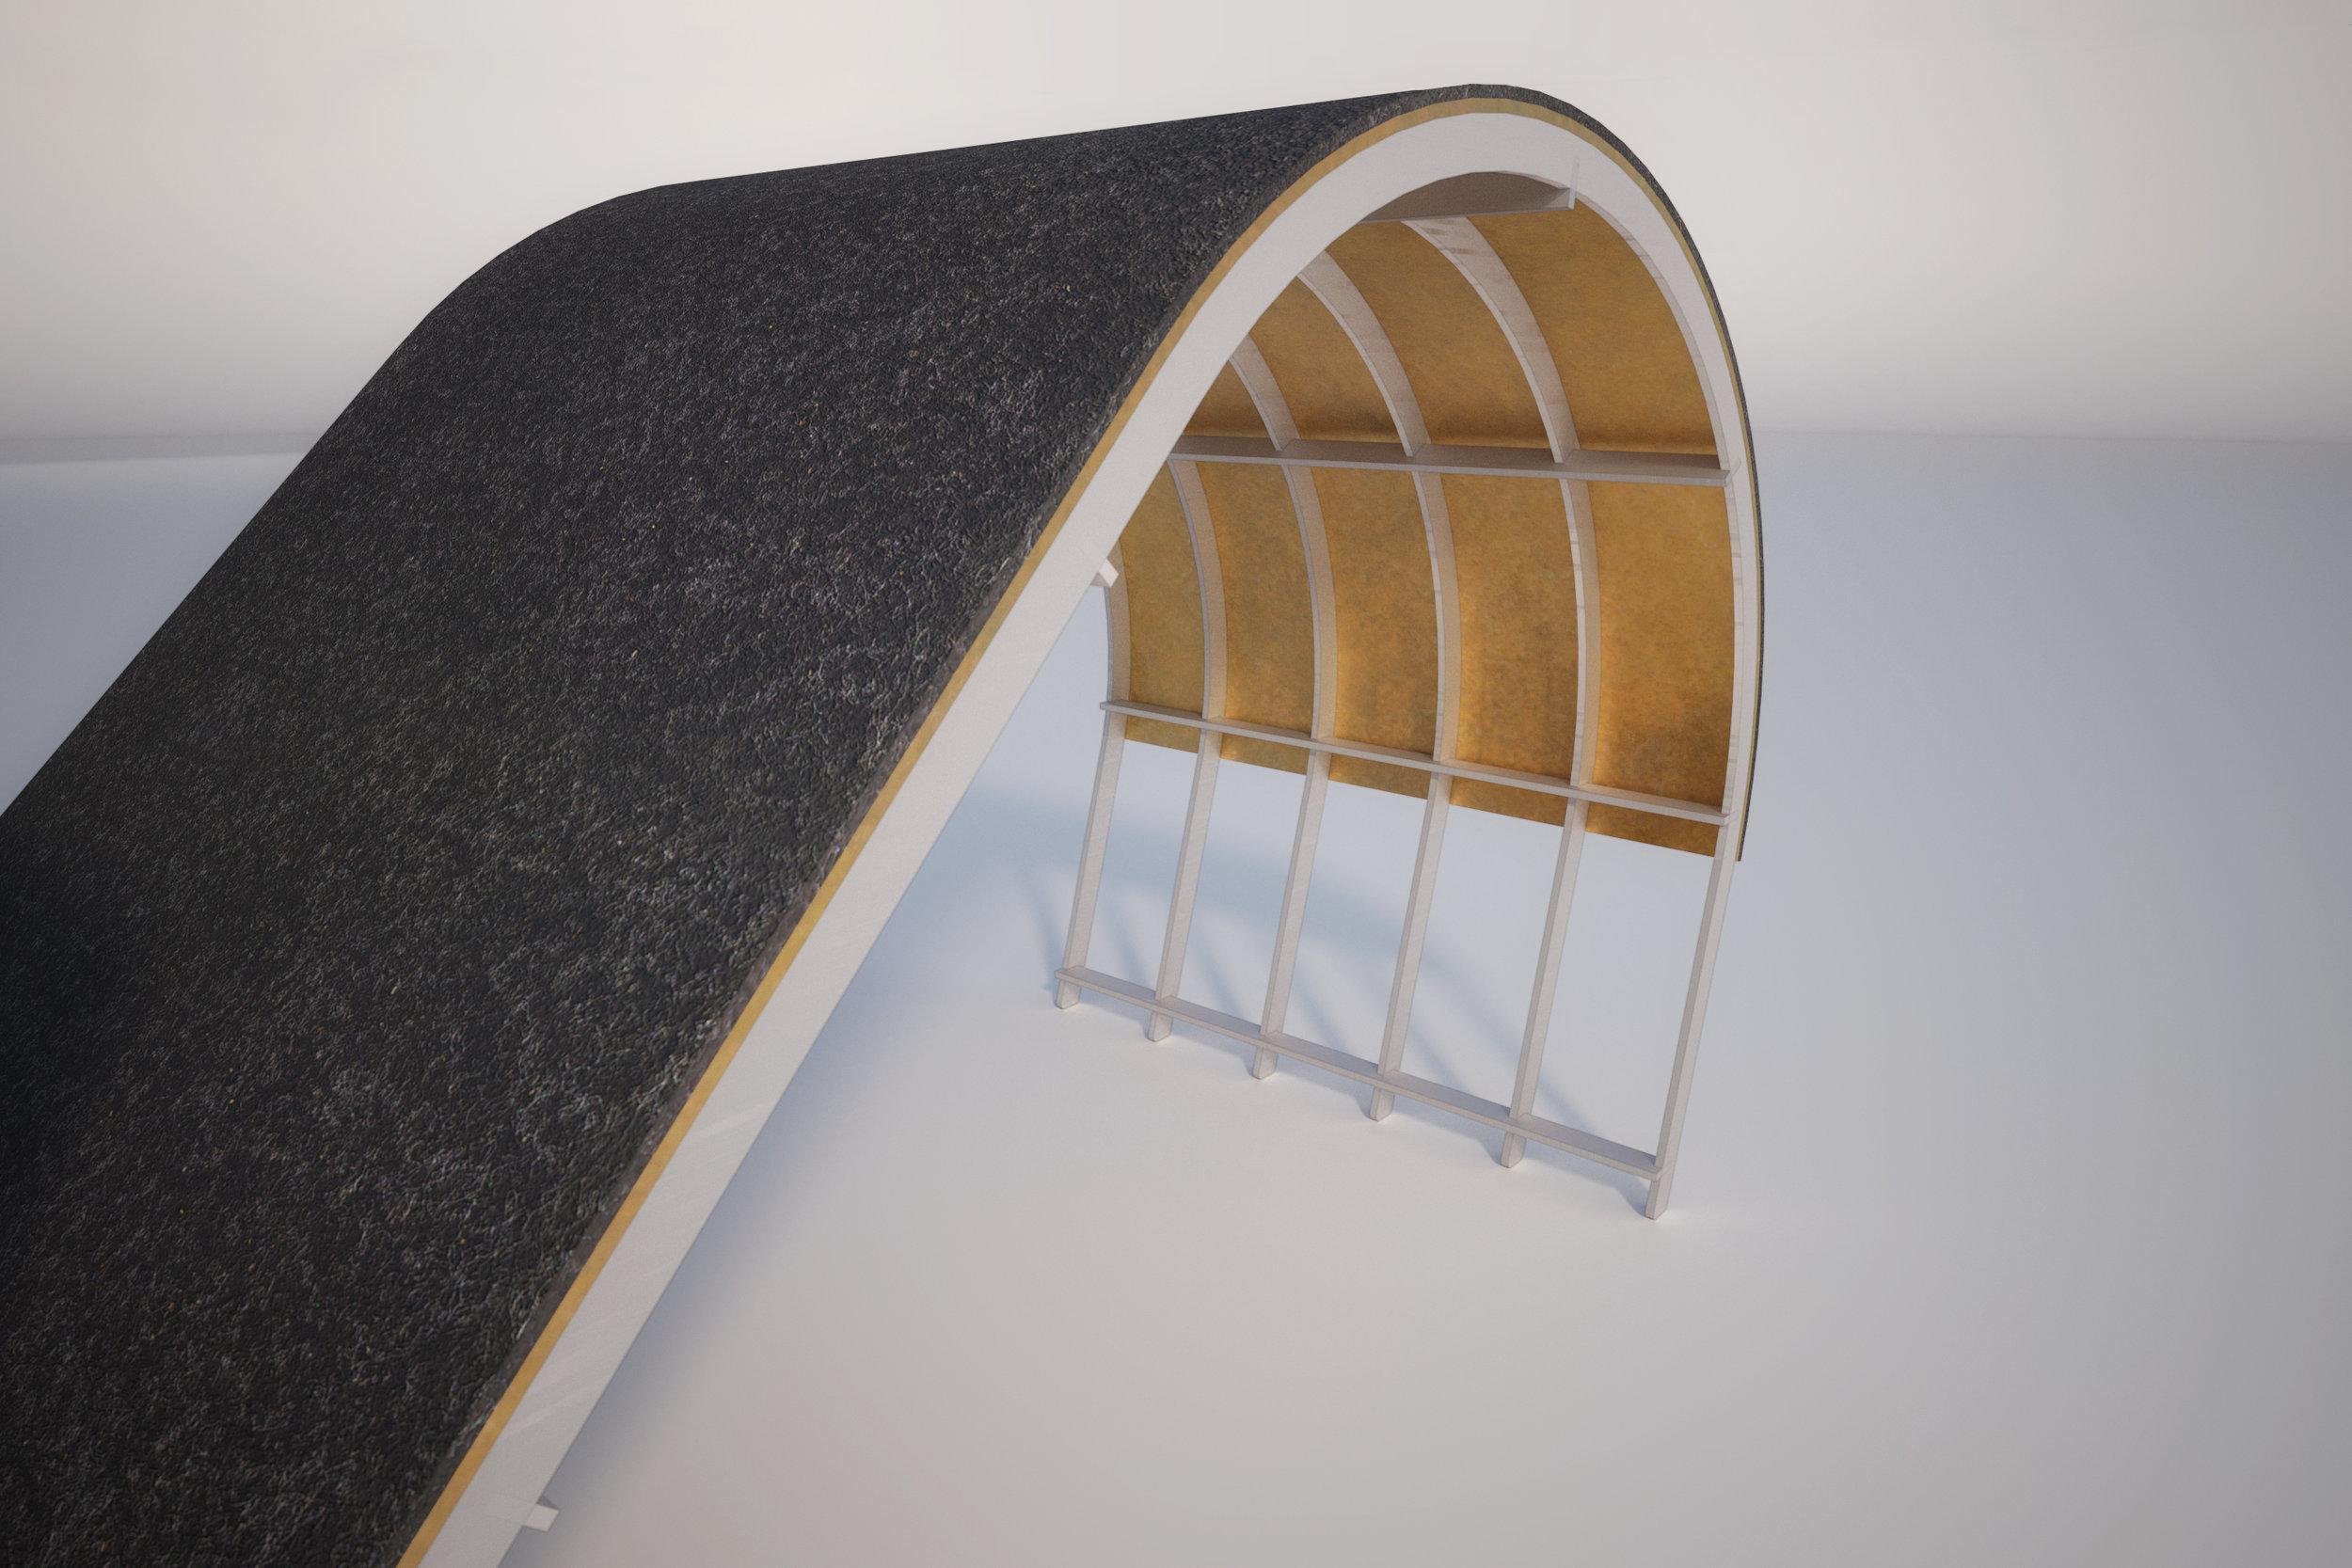 17703 Cor opus, Spine Chair - Zoom 171221.jpg